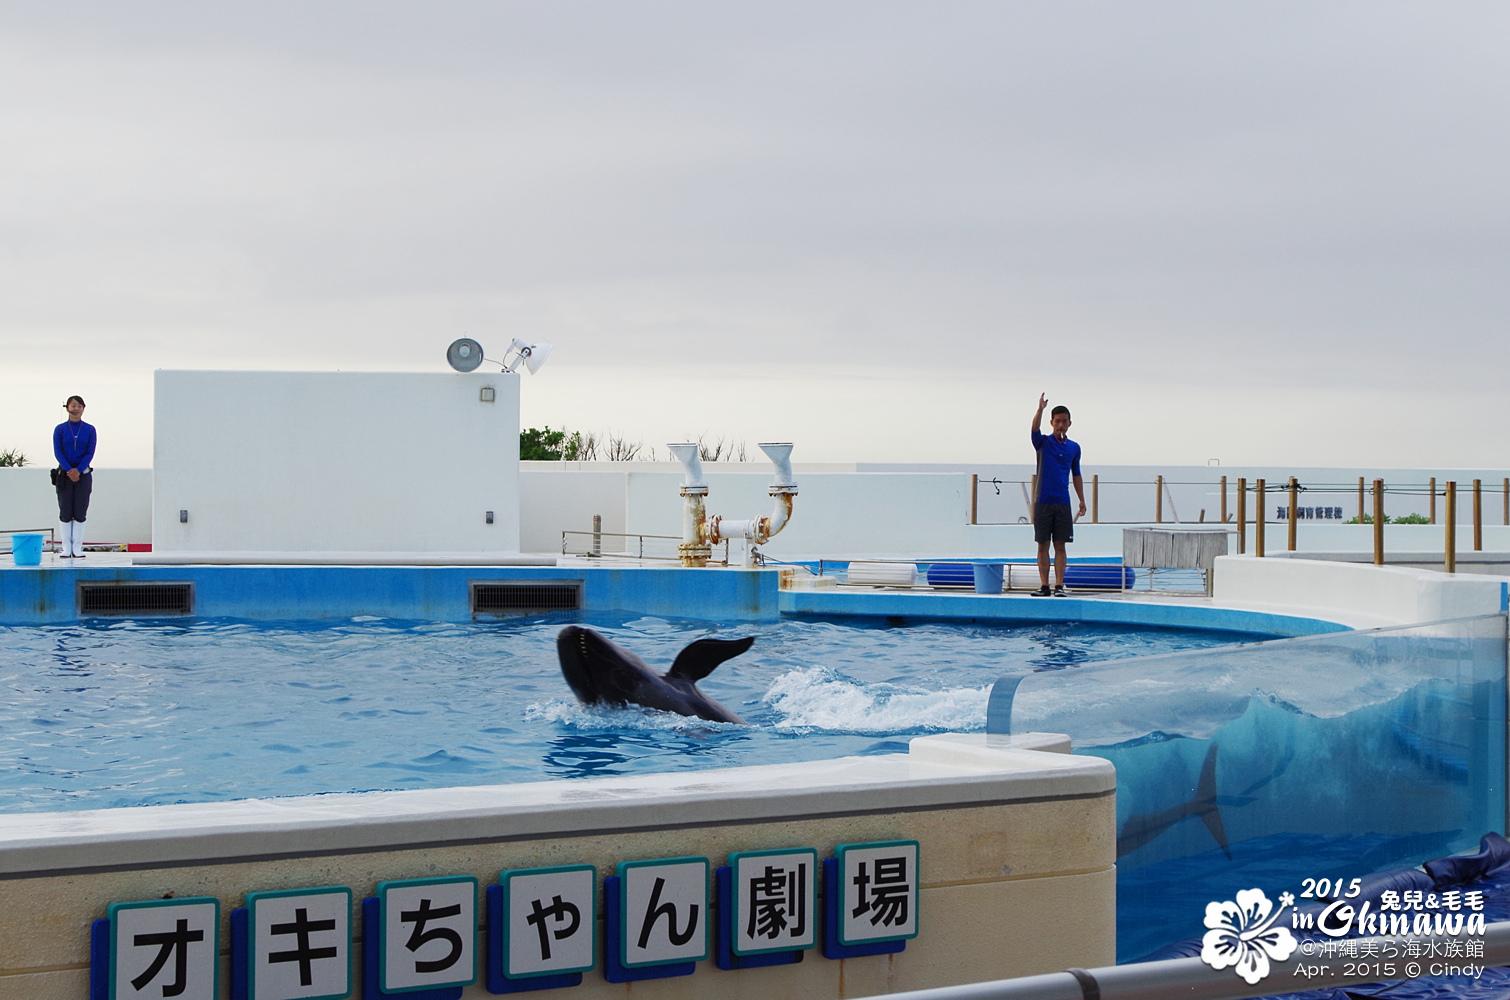 2015-0405-沖縄美ら海水族館-49